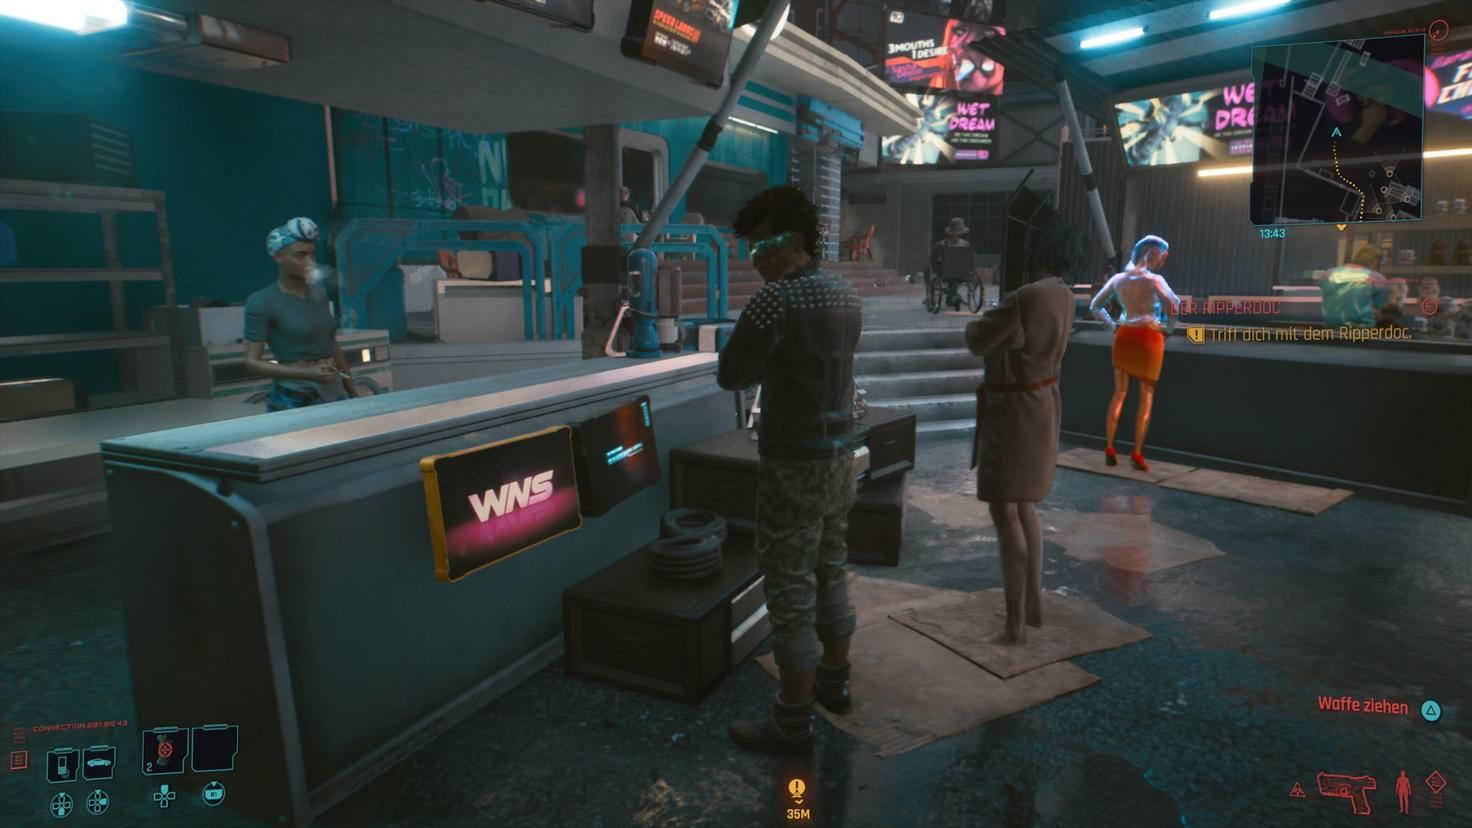 cyberpunk-2077-ps4-screenshot-01